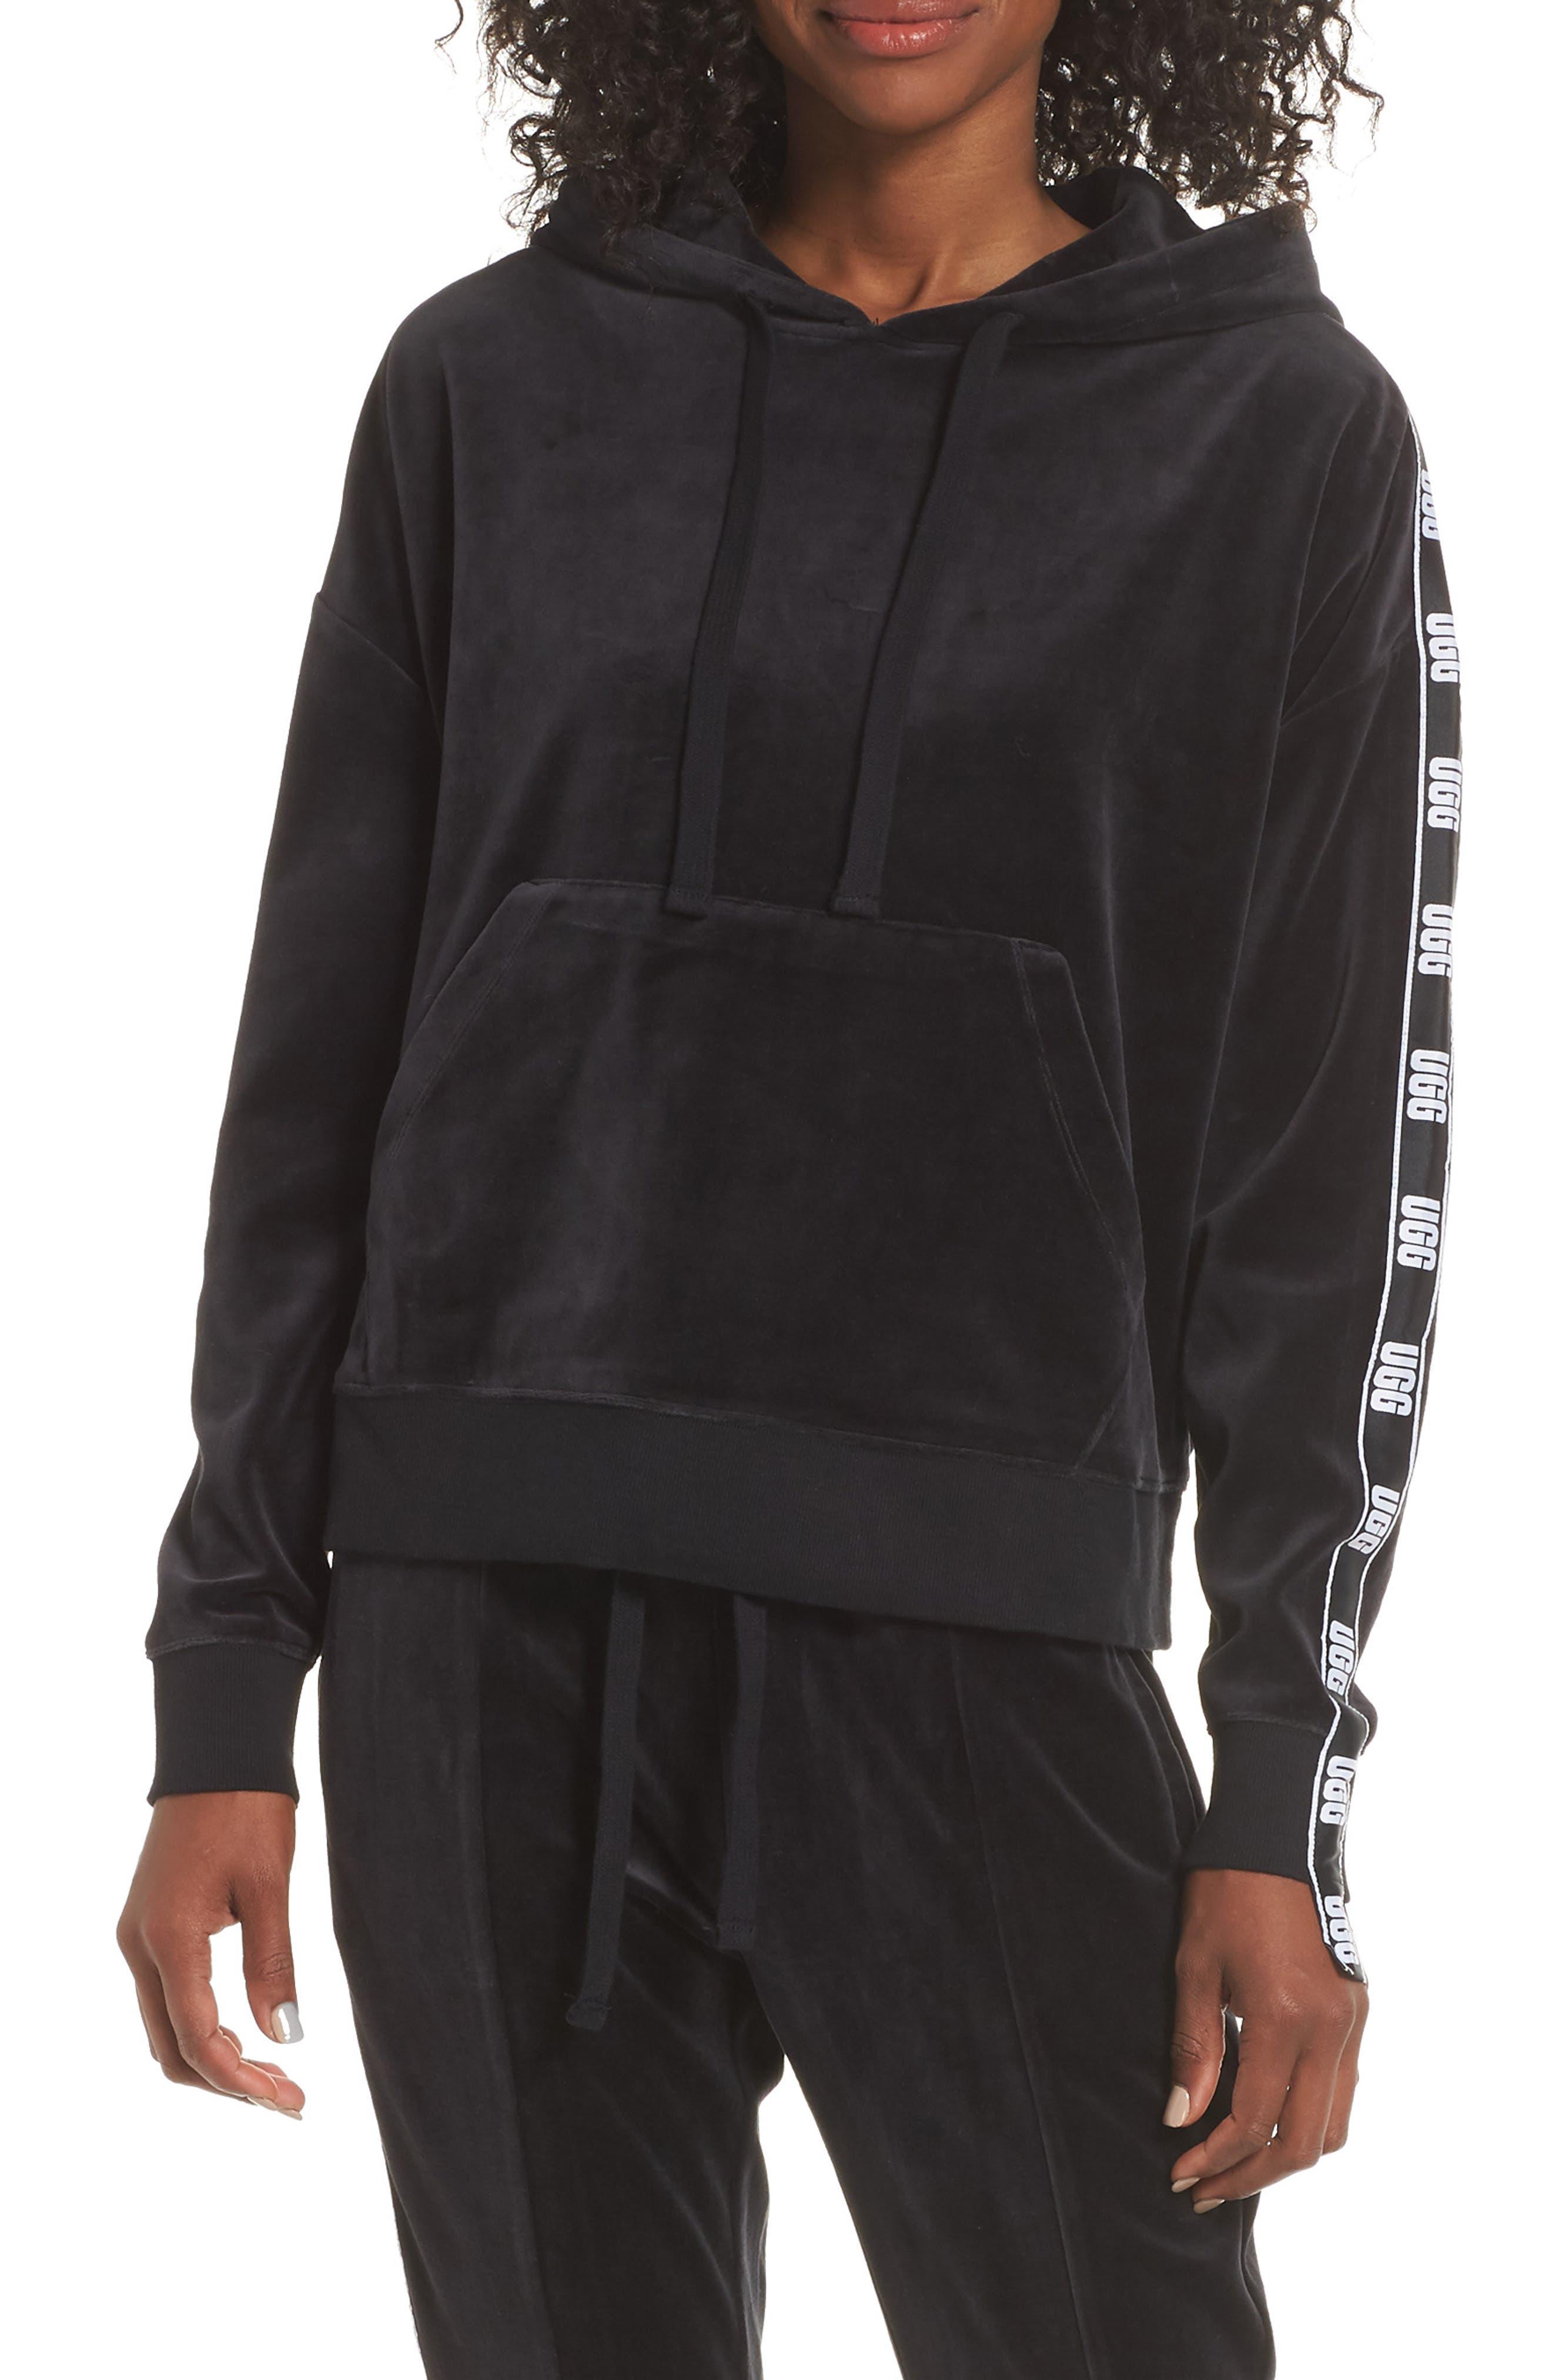 UGG<SUP>®</SUP> Iris Track Jacket, Main, color, 001